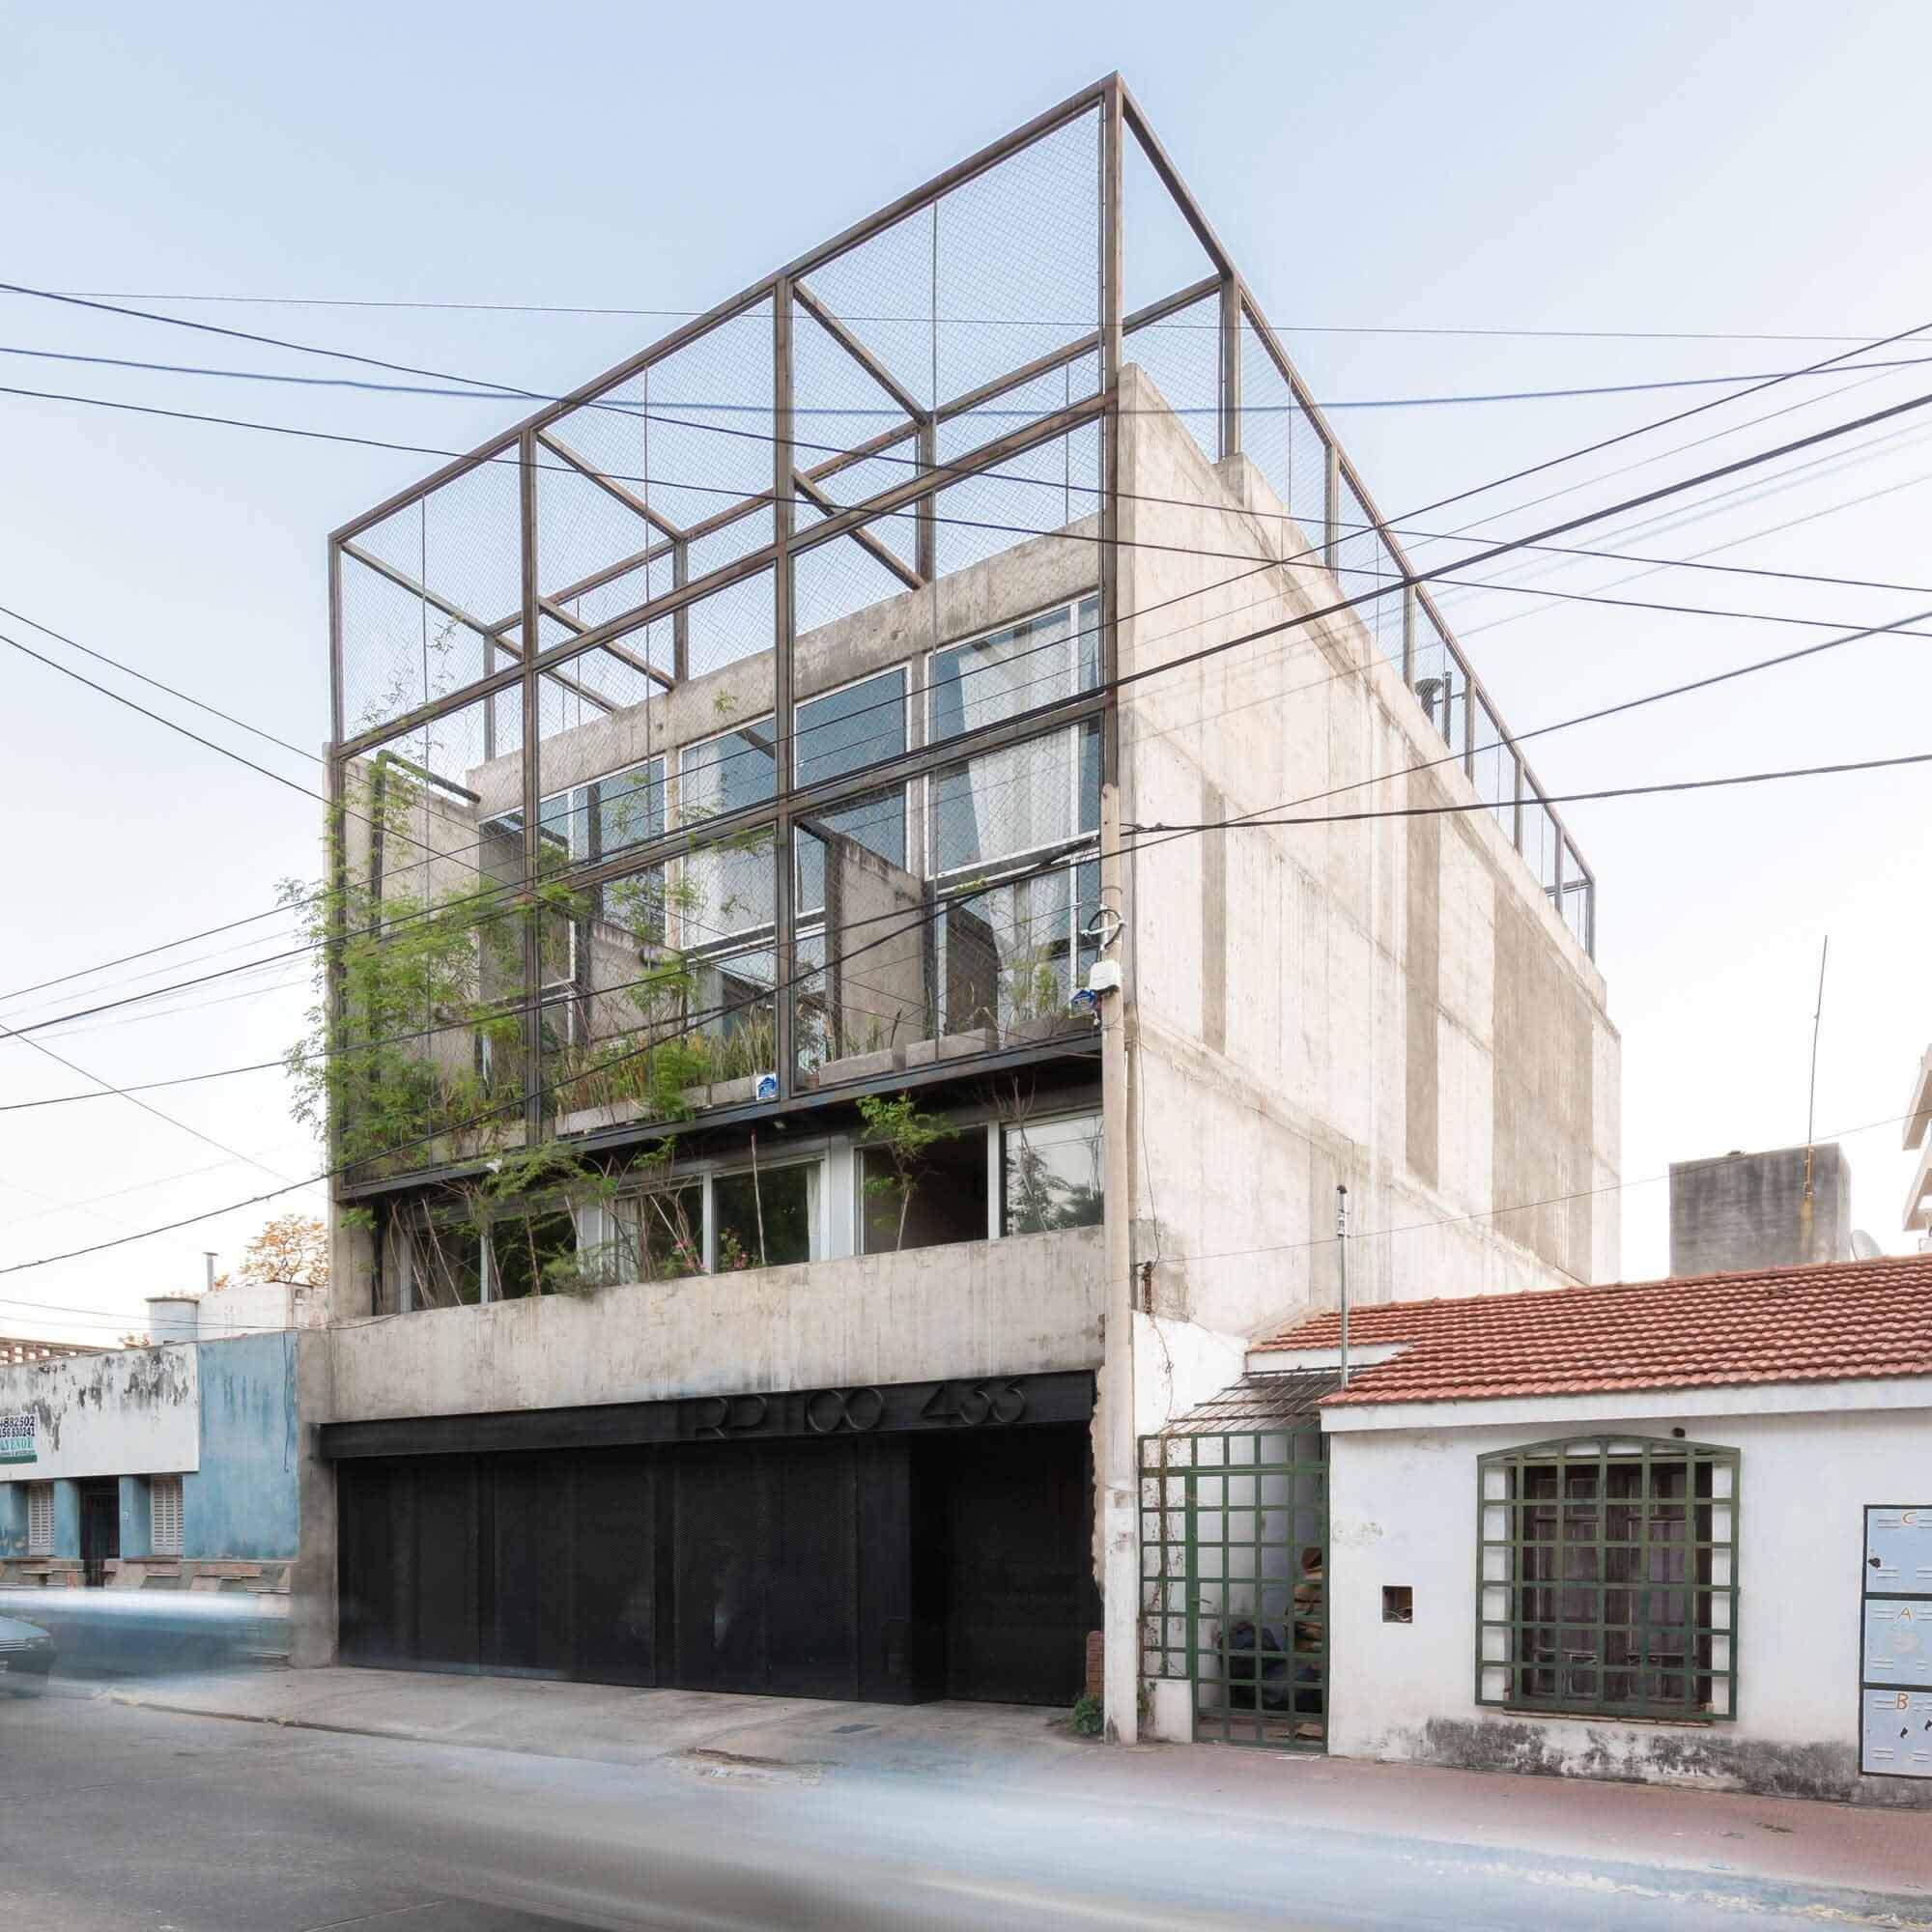 Здание Триптико / Мариела Маркизио + Кристиан Нанзер + Херман Маргерит